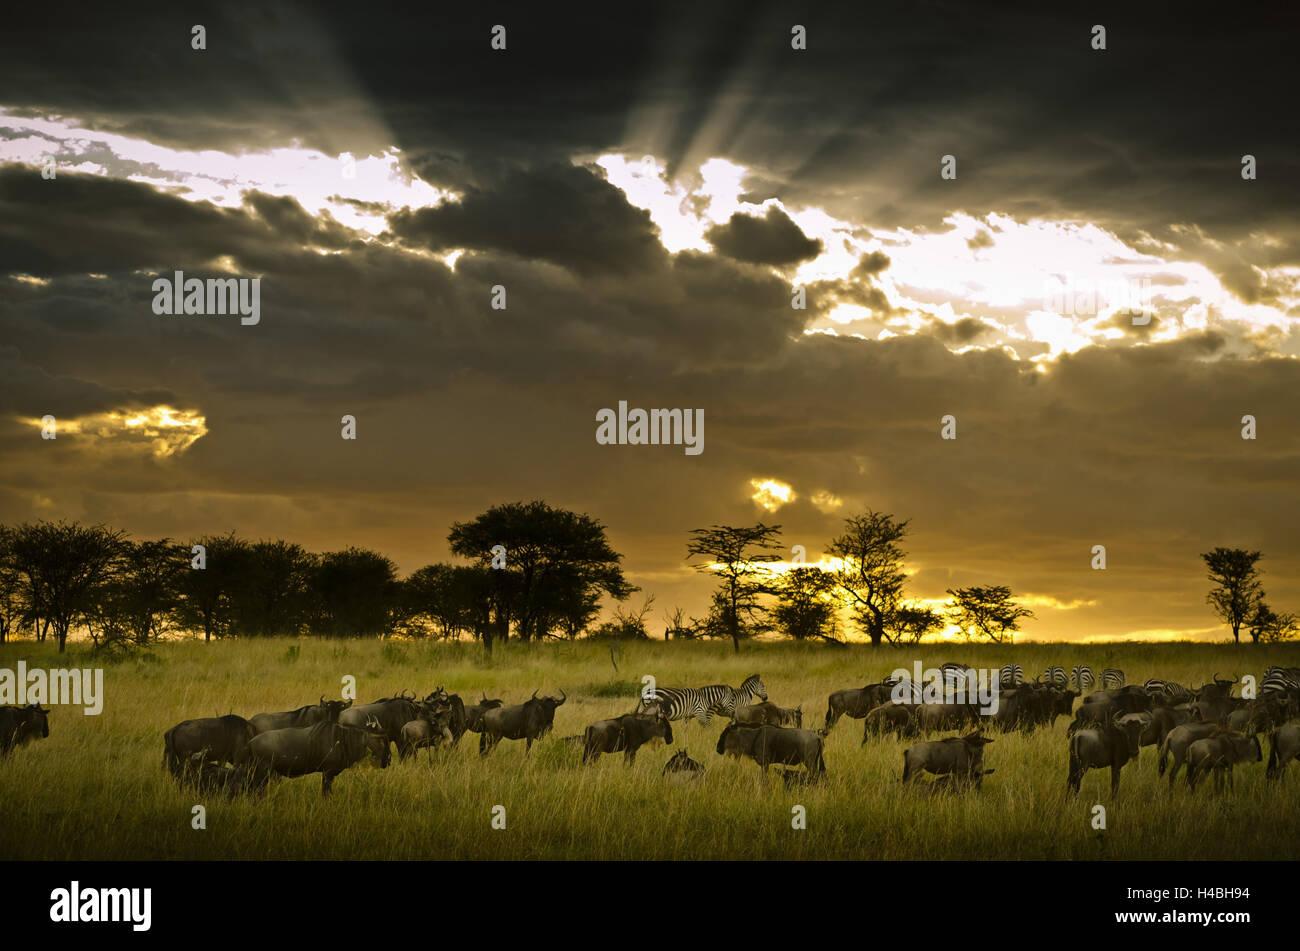 África, África Oriental, Tanzania Serengeti, mundo animal, ñúes, cebras, Imagen De Stock